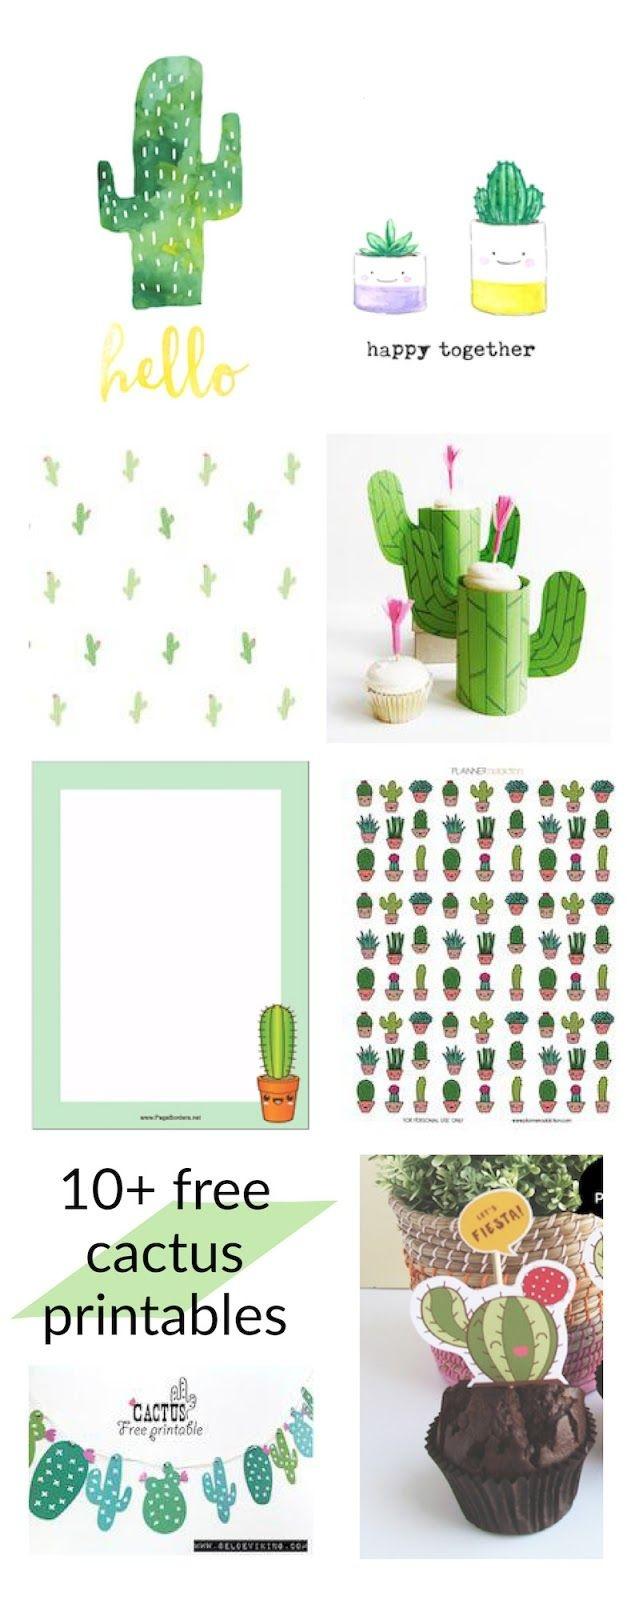 Free Cactus Printables - Kaktus - Round-Up | Printables | Classroom - Free Cactus Printable